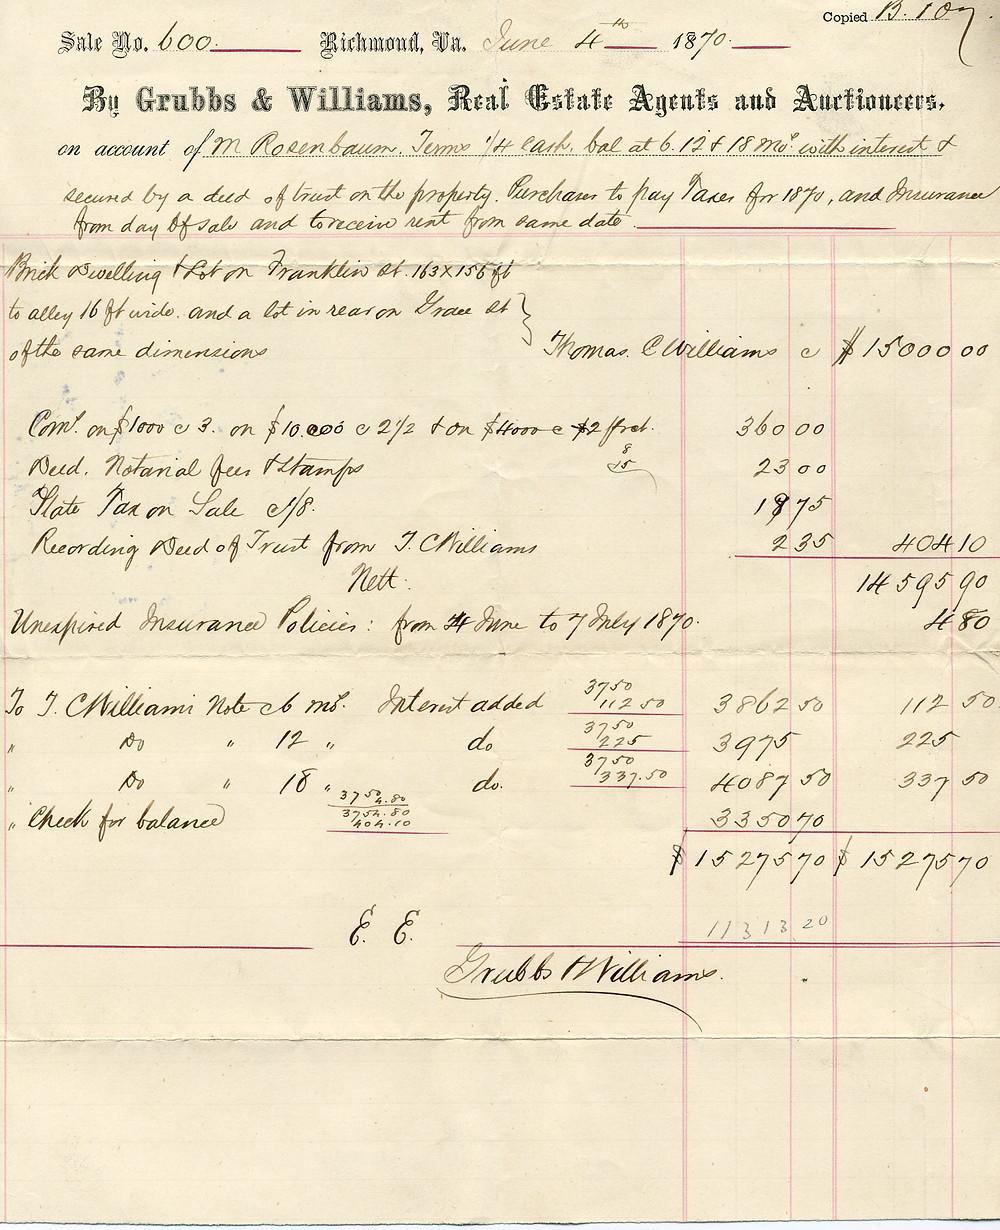 Historic receipt for 816 W Franklin Street residence